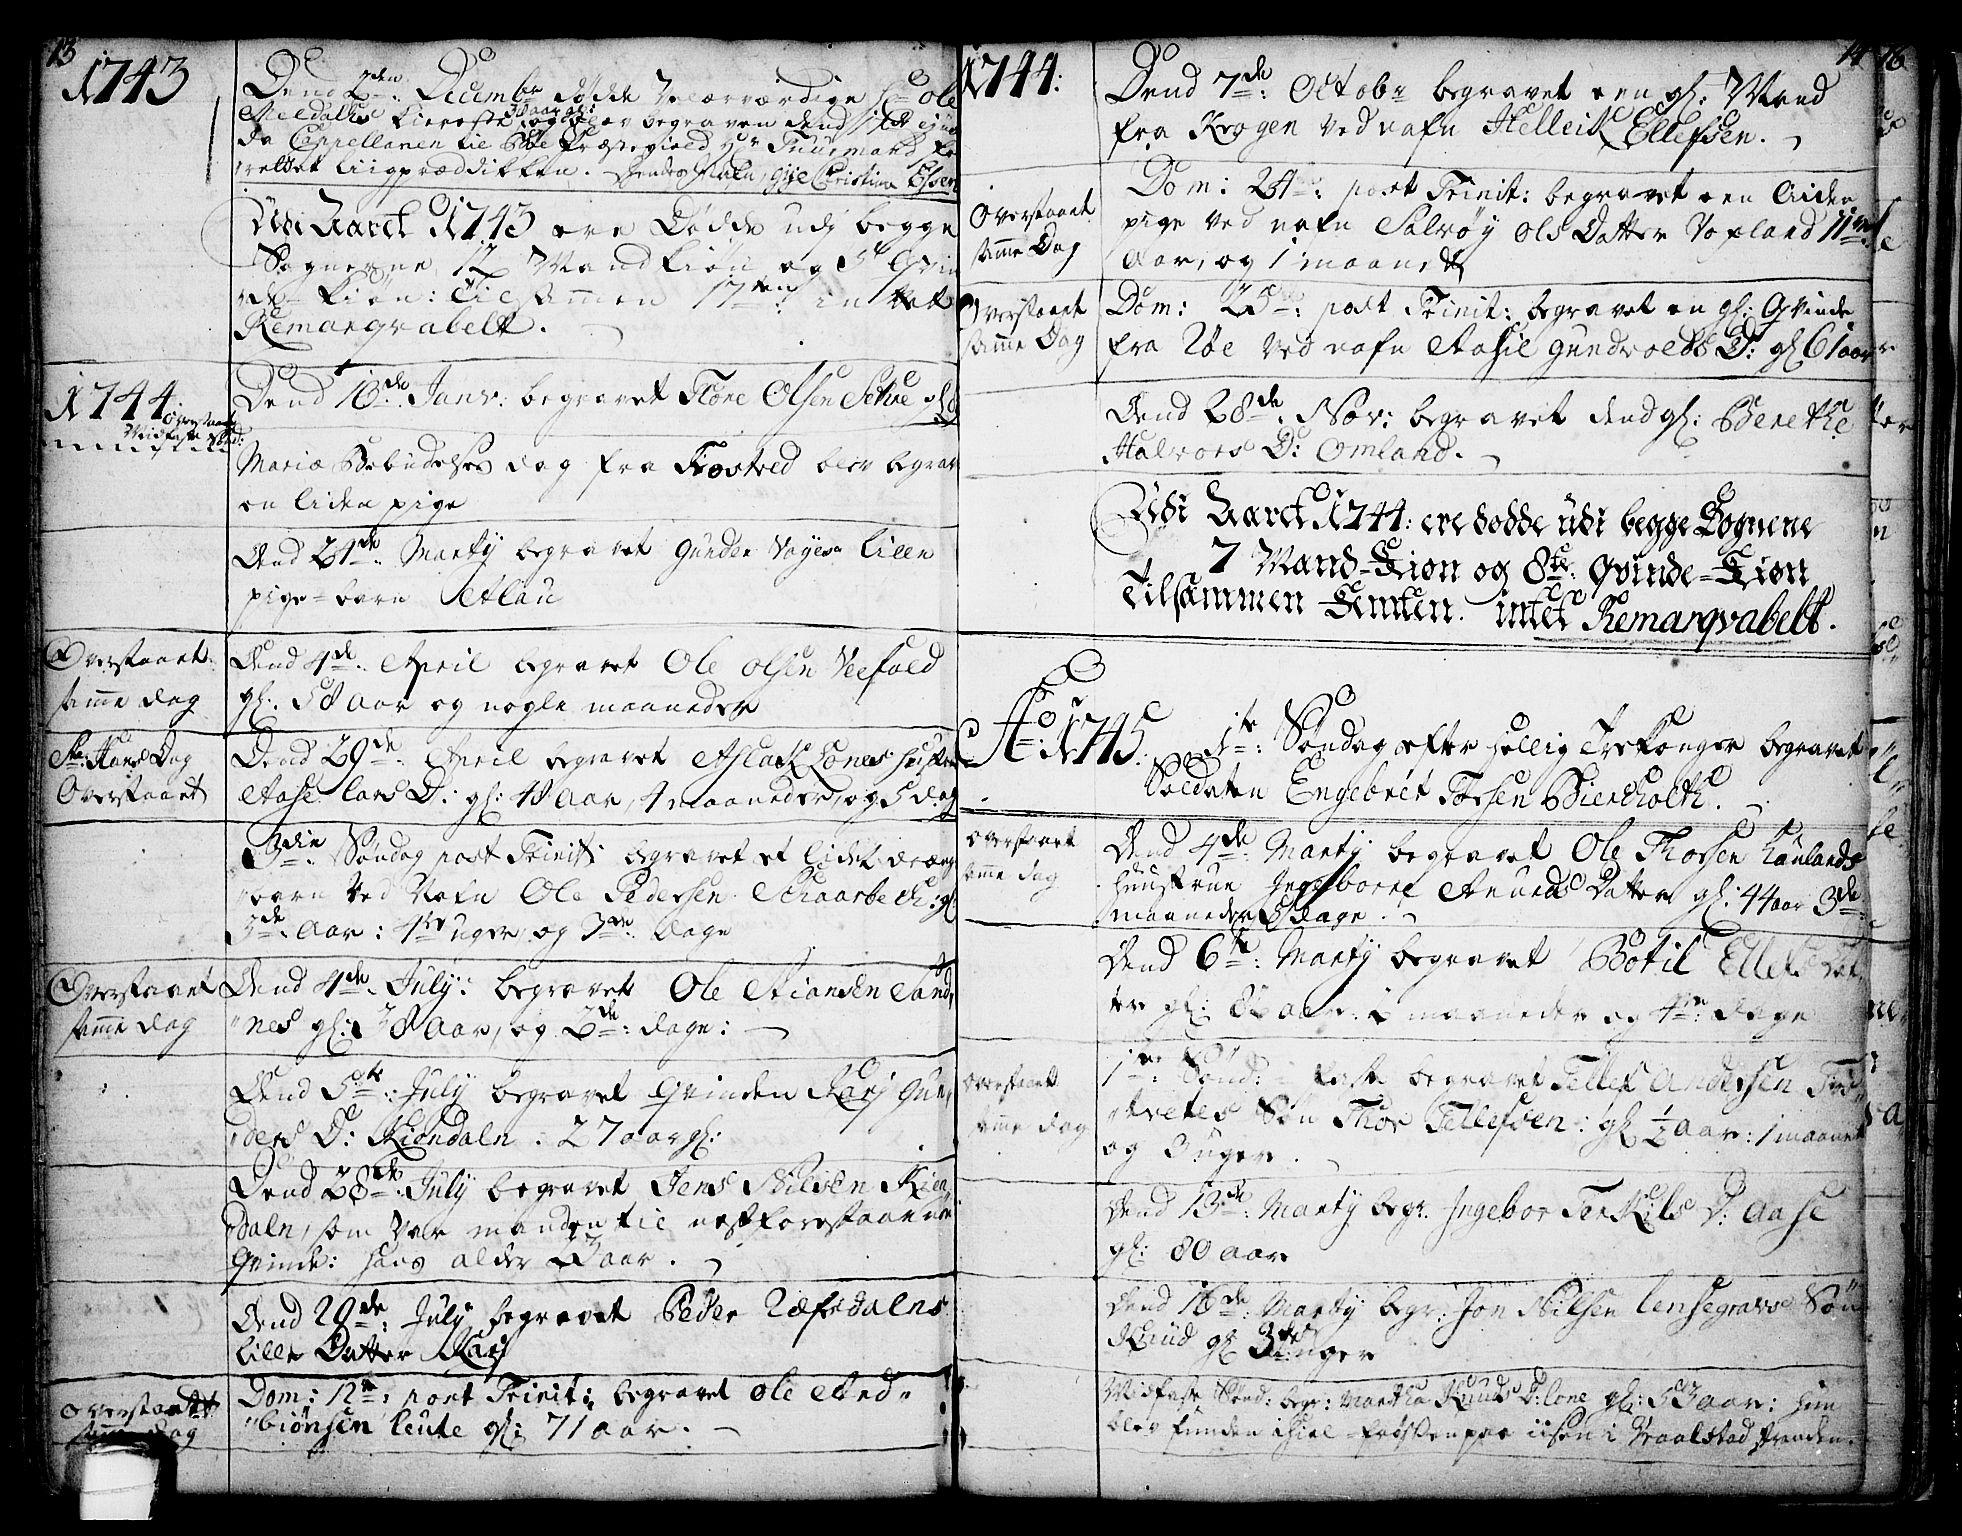 SAKO, Drangedal kirkebøker, F/Fa/L0002: Ministerialbok nr. 2, 1733-1753, s. 13-14